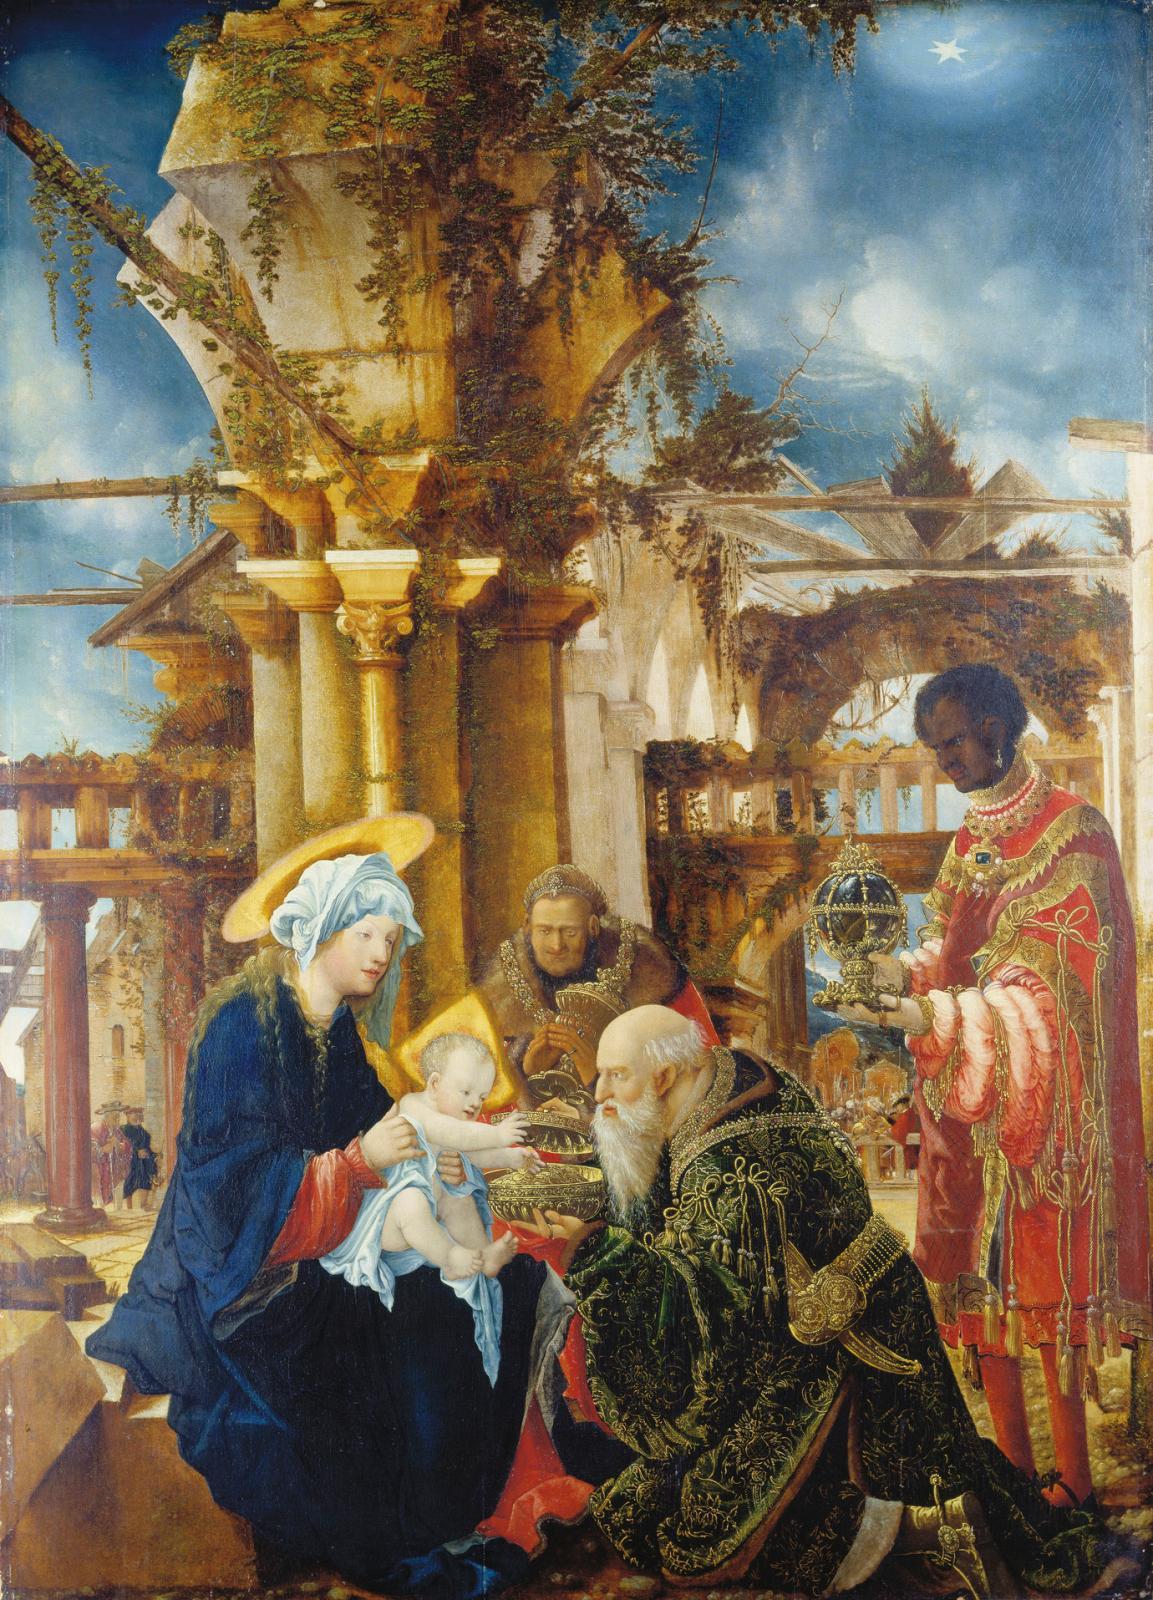 Nativité, 1511, Francfort, Städel Museum. ©Städel Museum